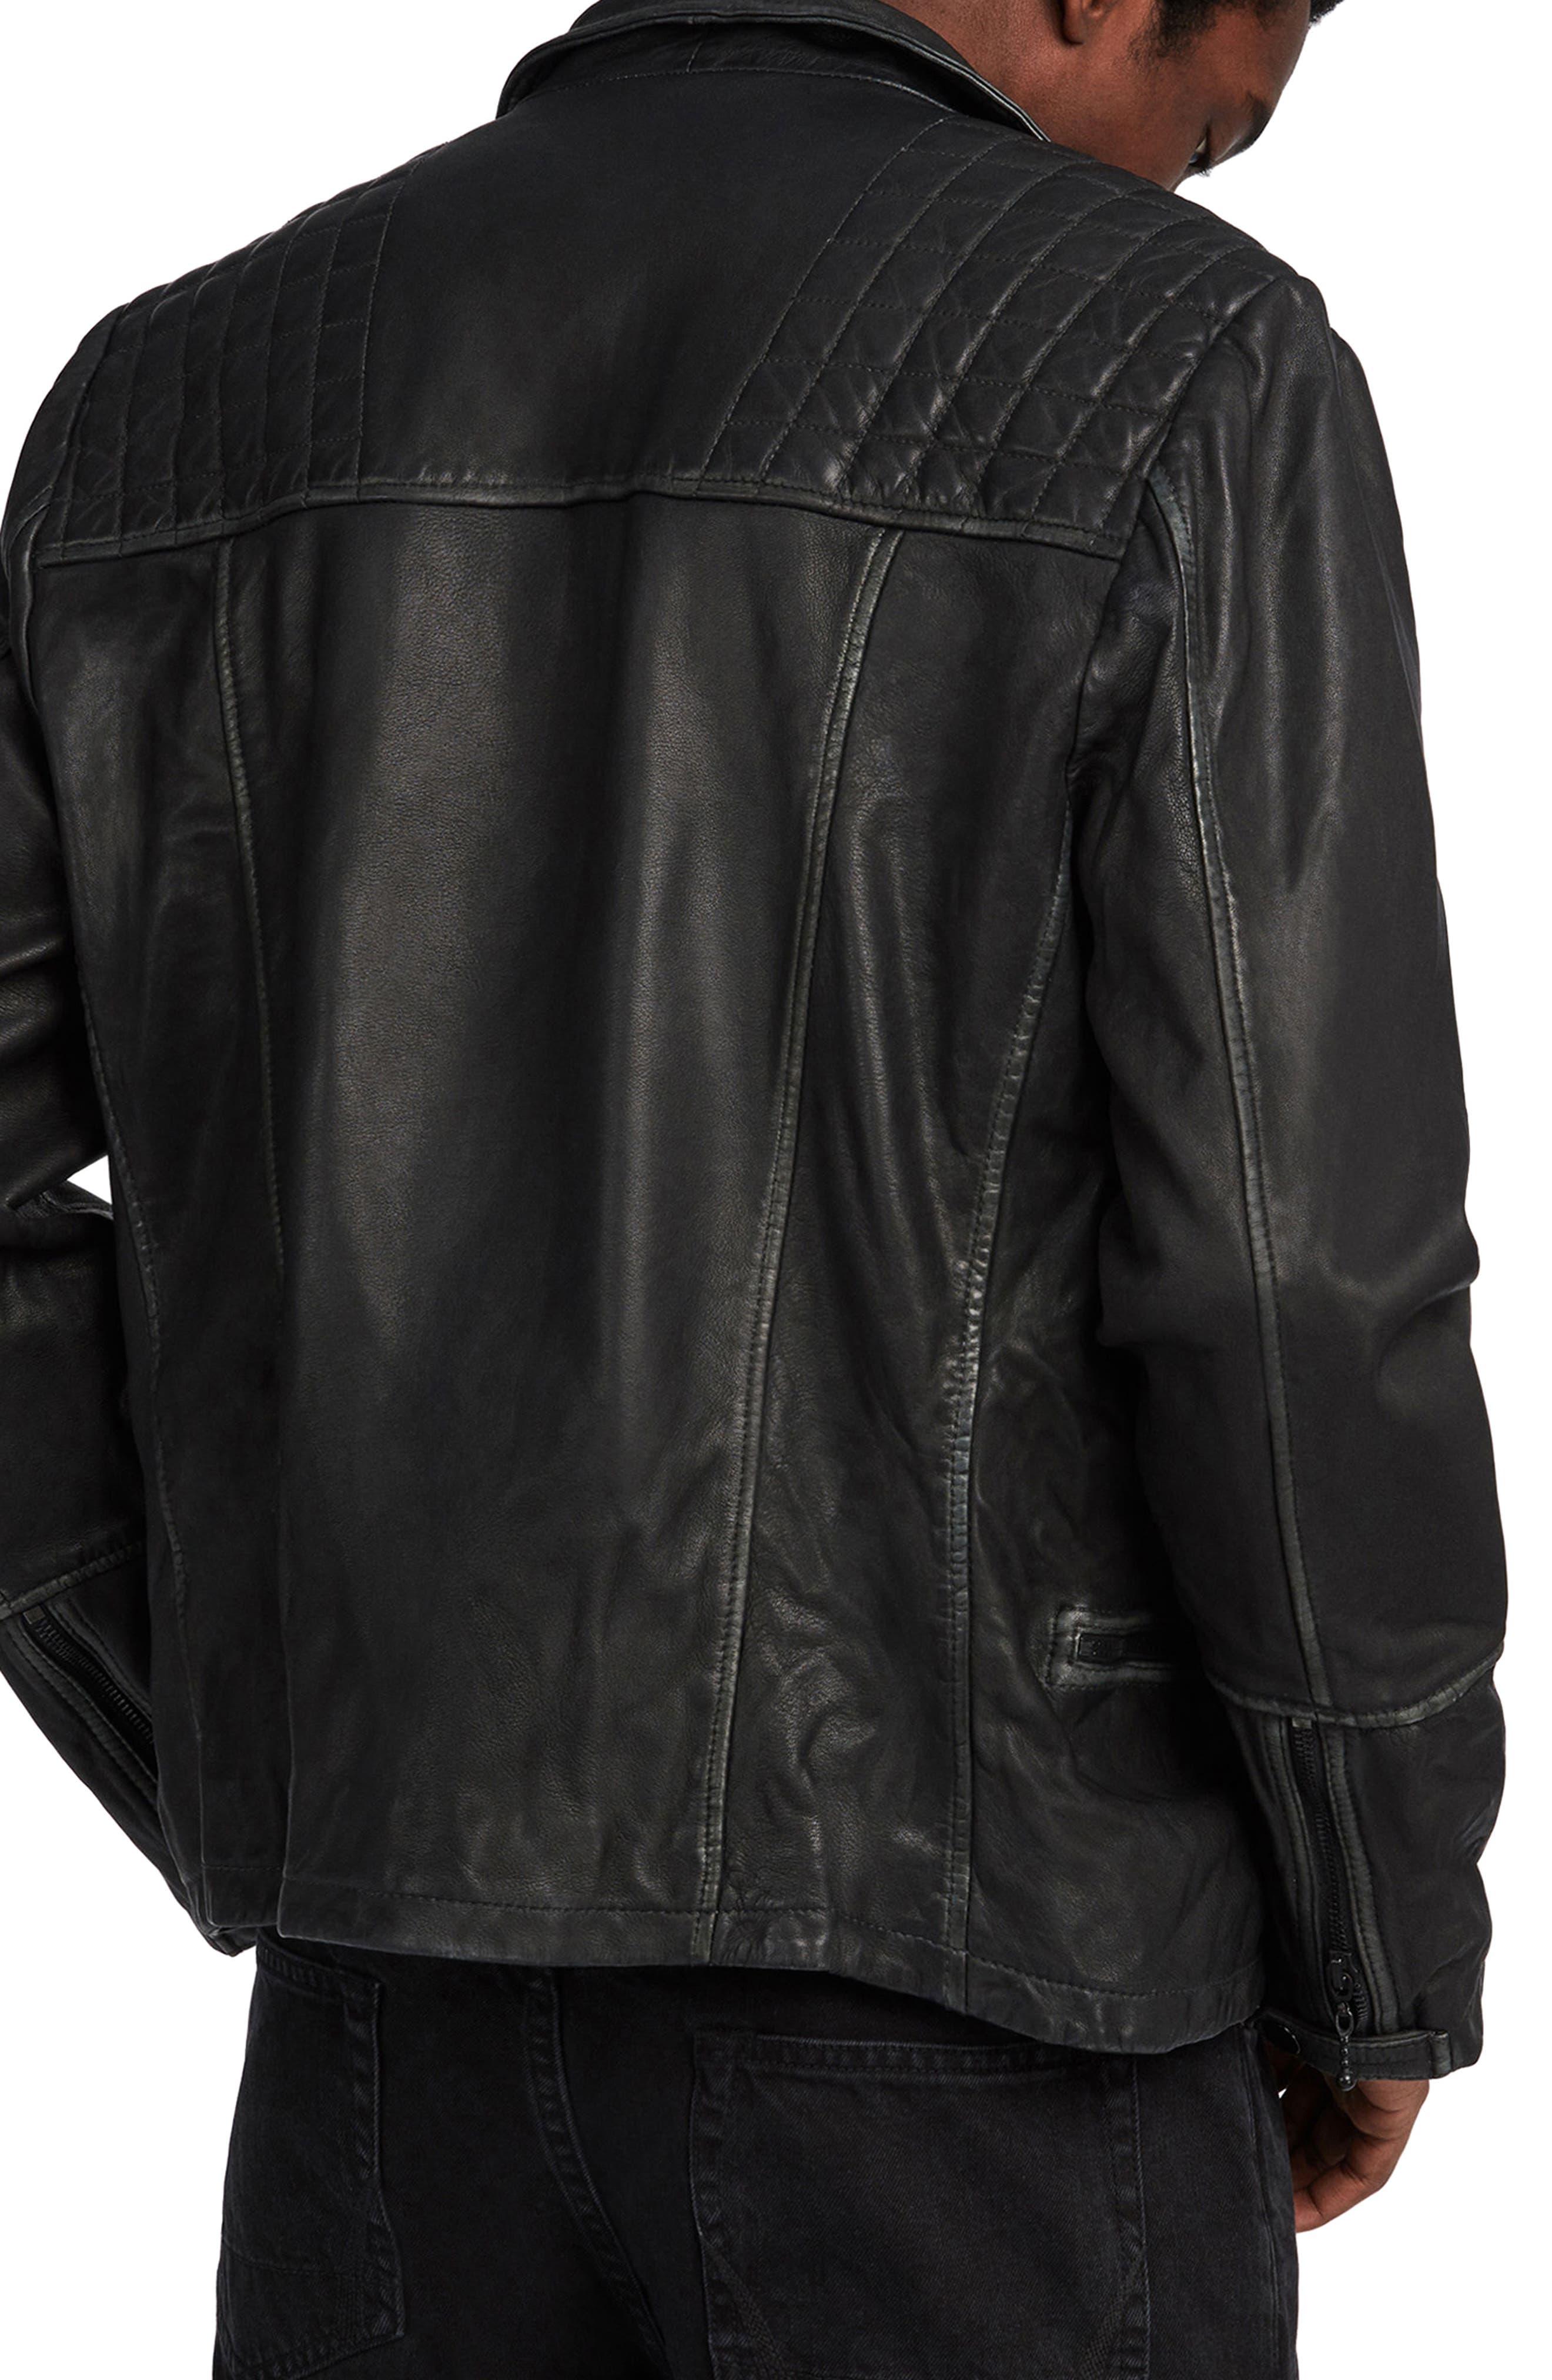 ALLSAINTS, Cargo Biker Slim Fit Leather Jacket, Alternate thumbnail 2, color, BLACK GREY